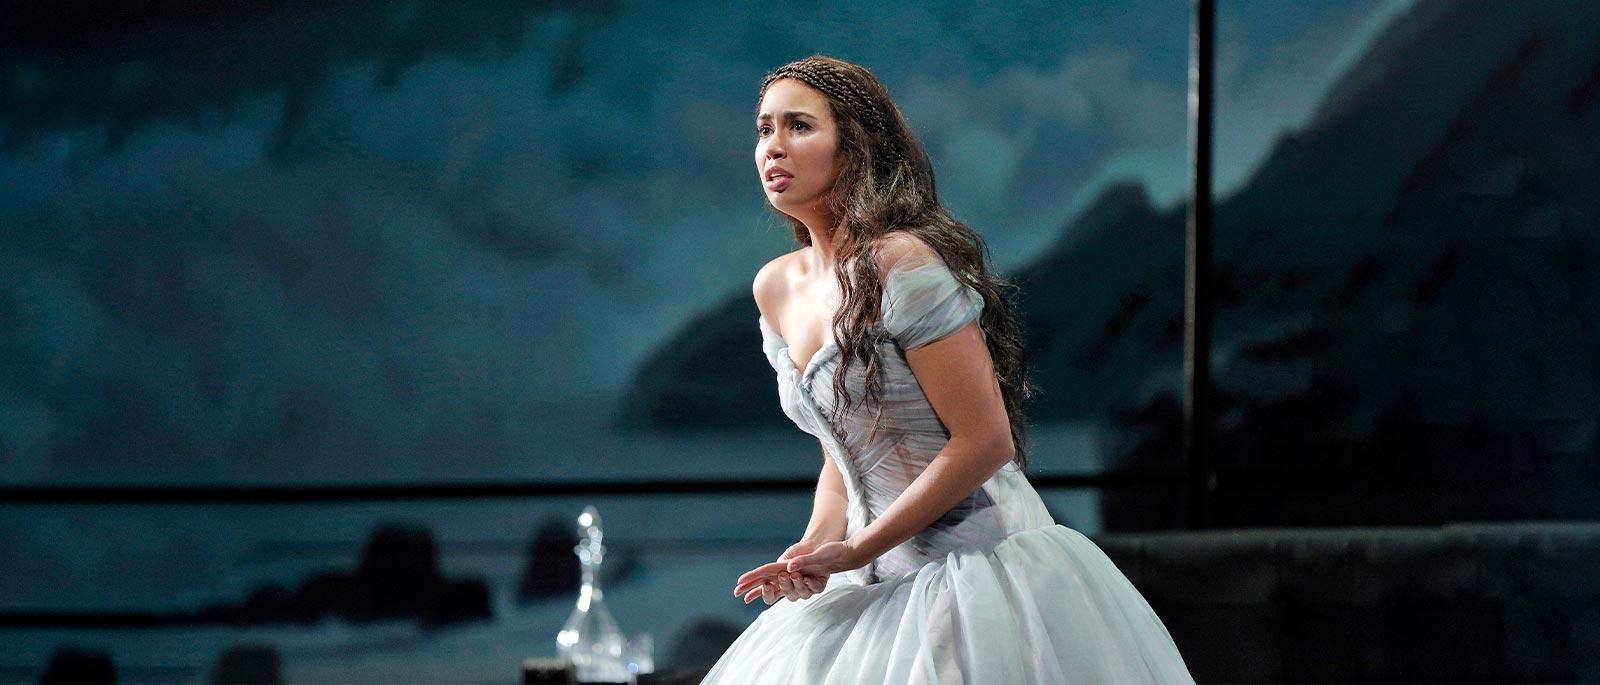 Met Opera: Lucia di Lammermoor